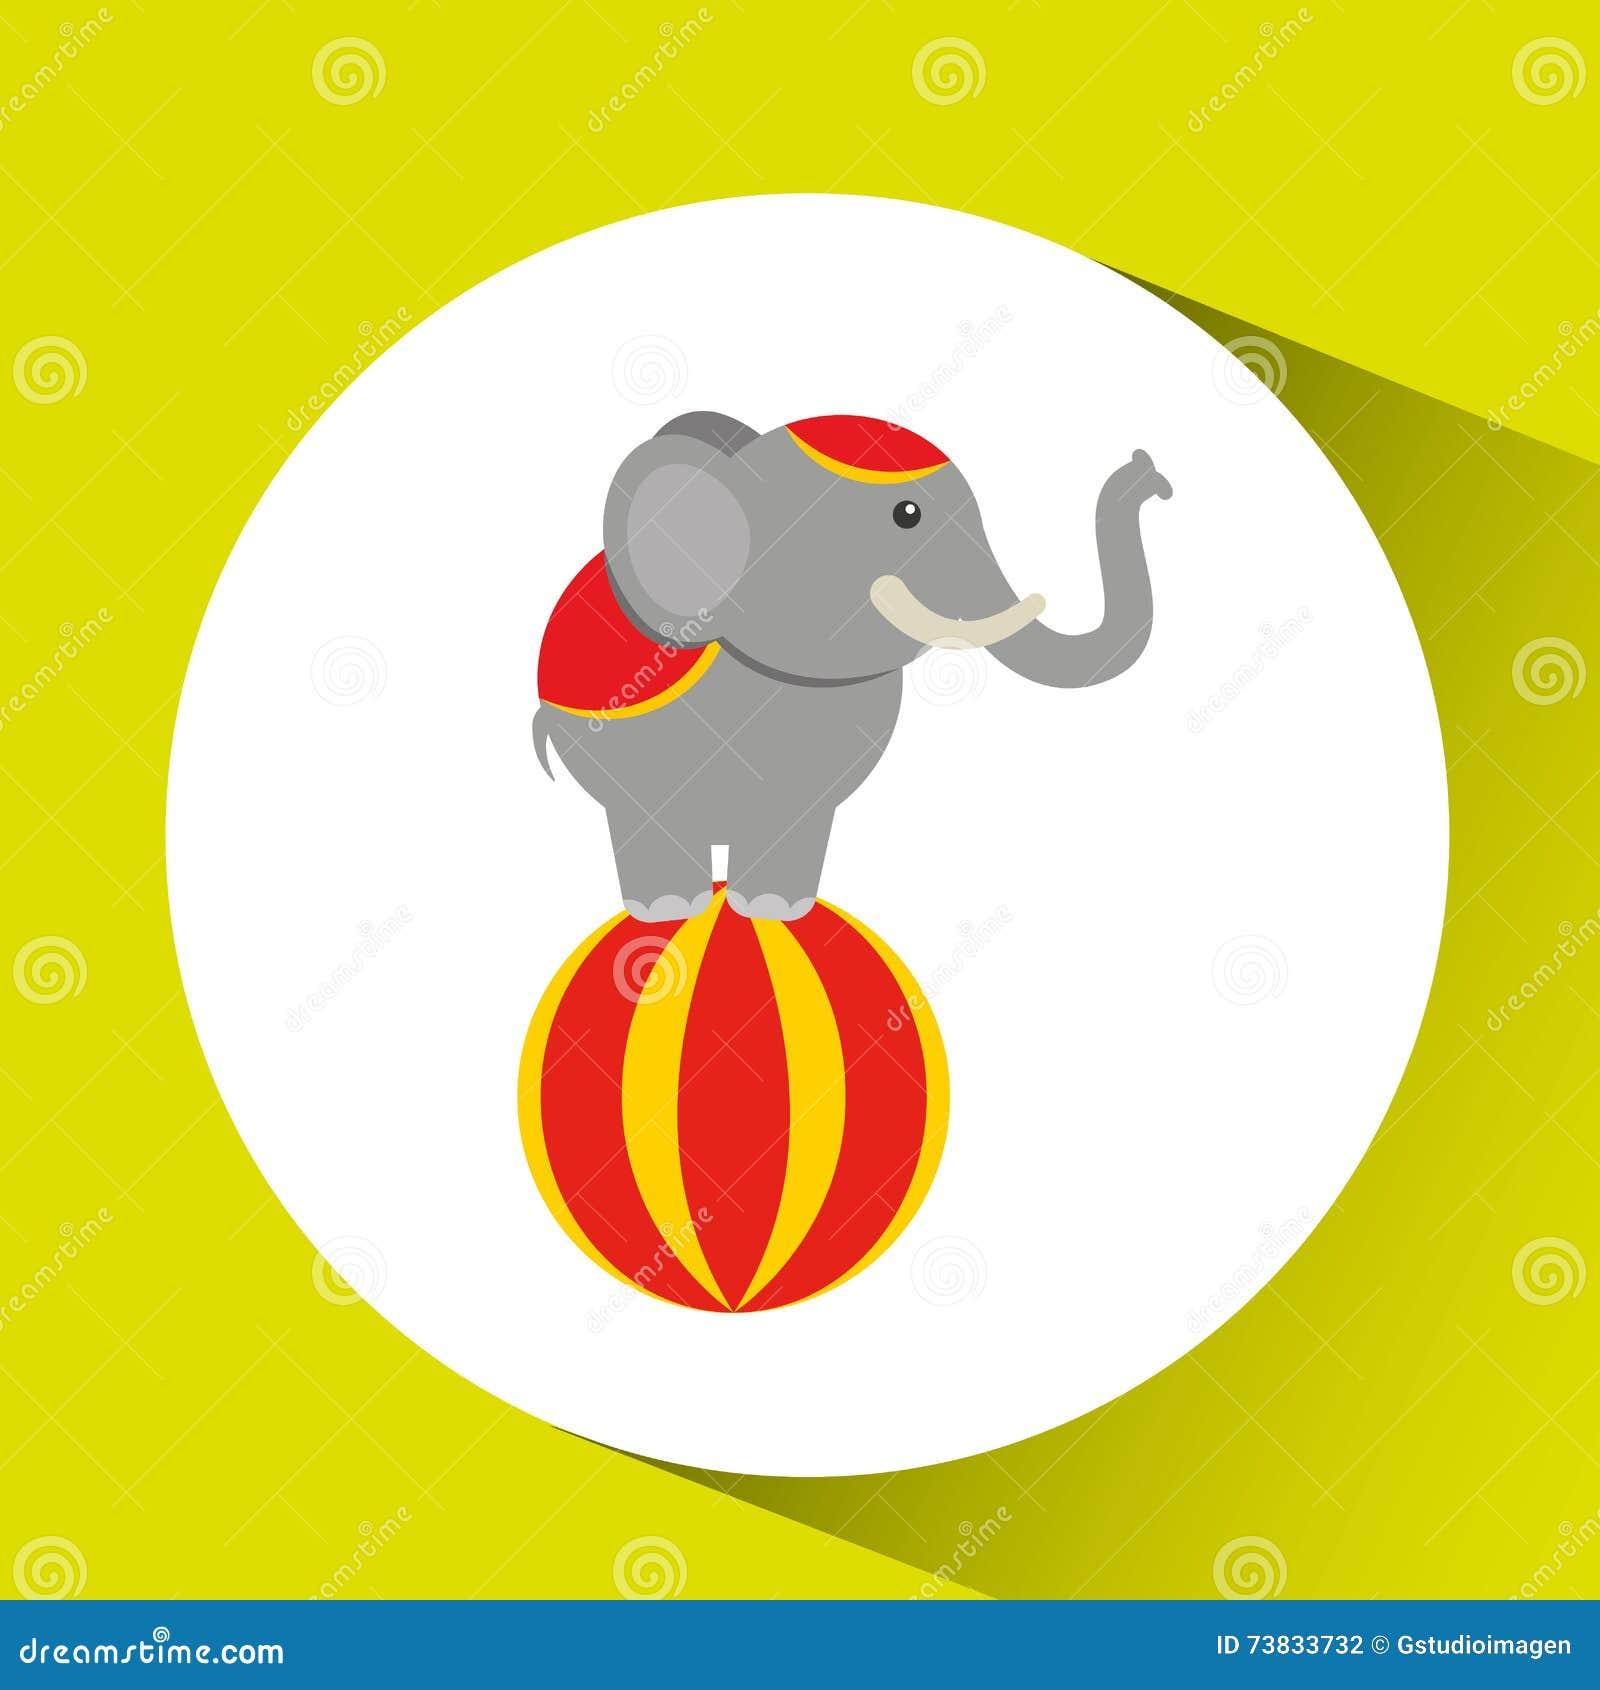 eb381c439c819 Circus Animal Isolated Icon Design Stock Illustration - Illustration ...